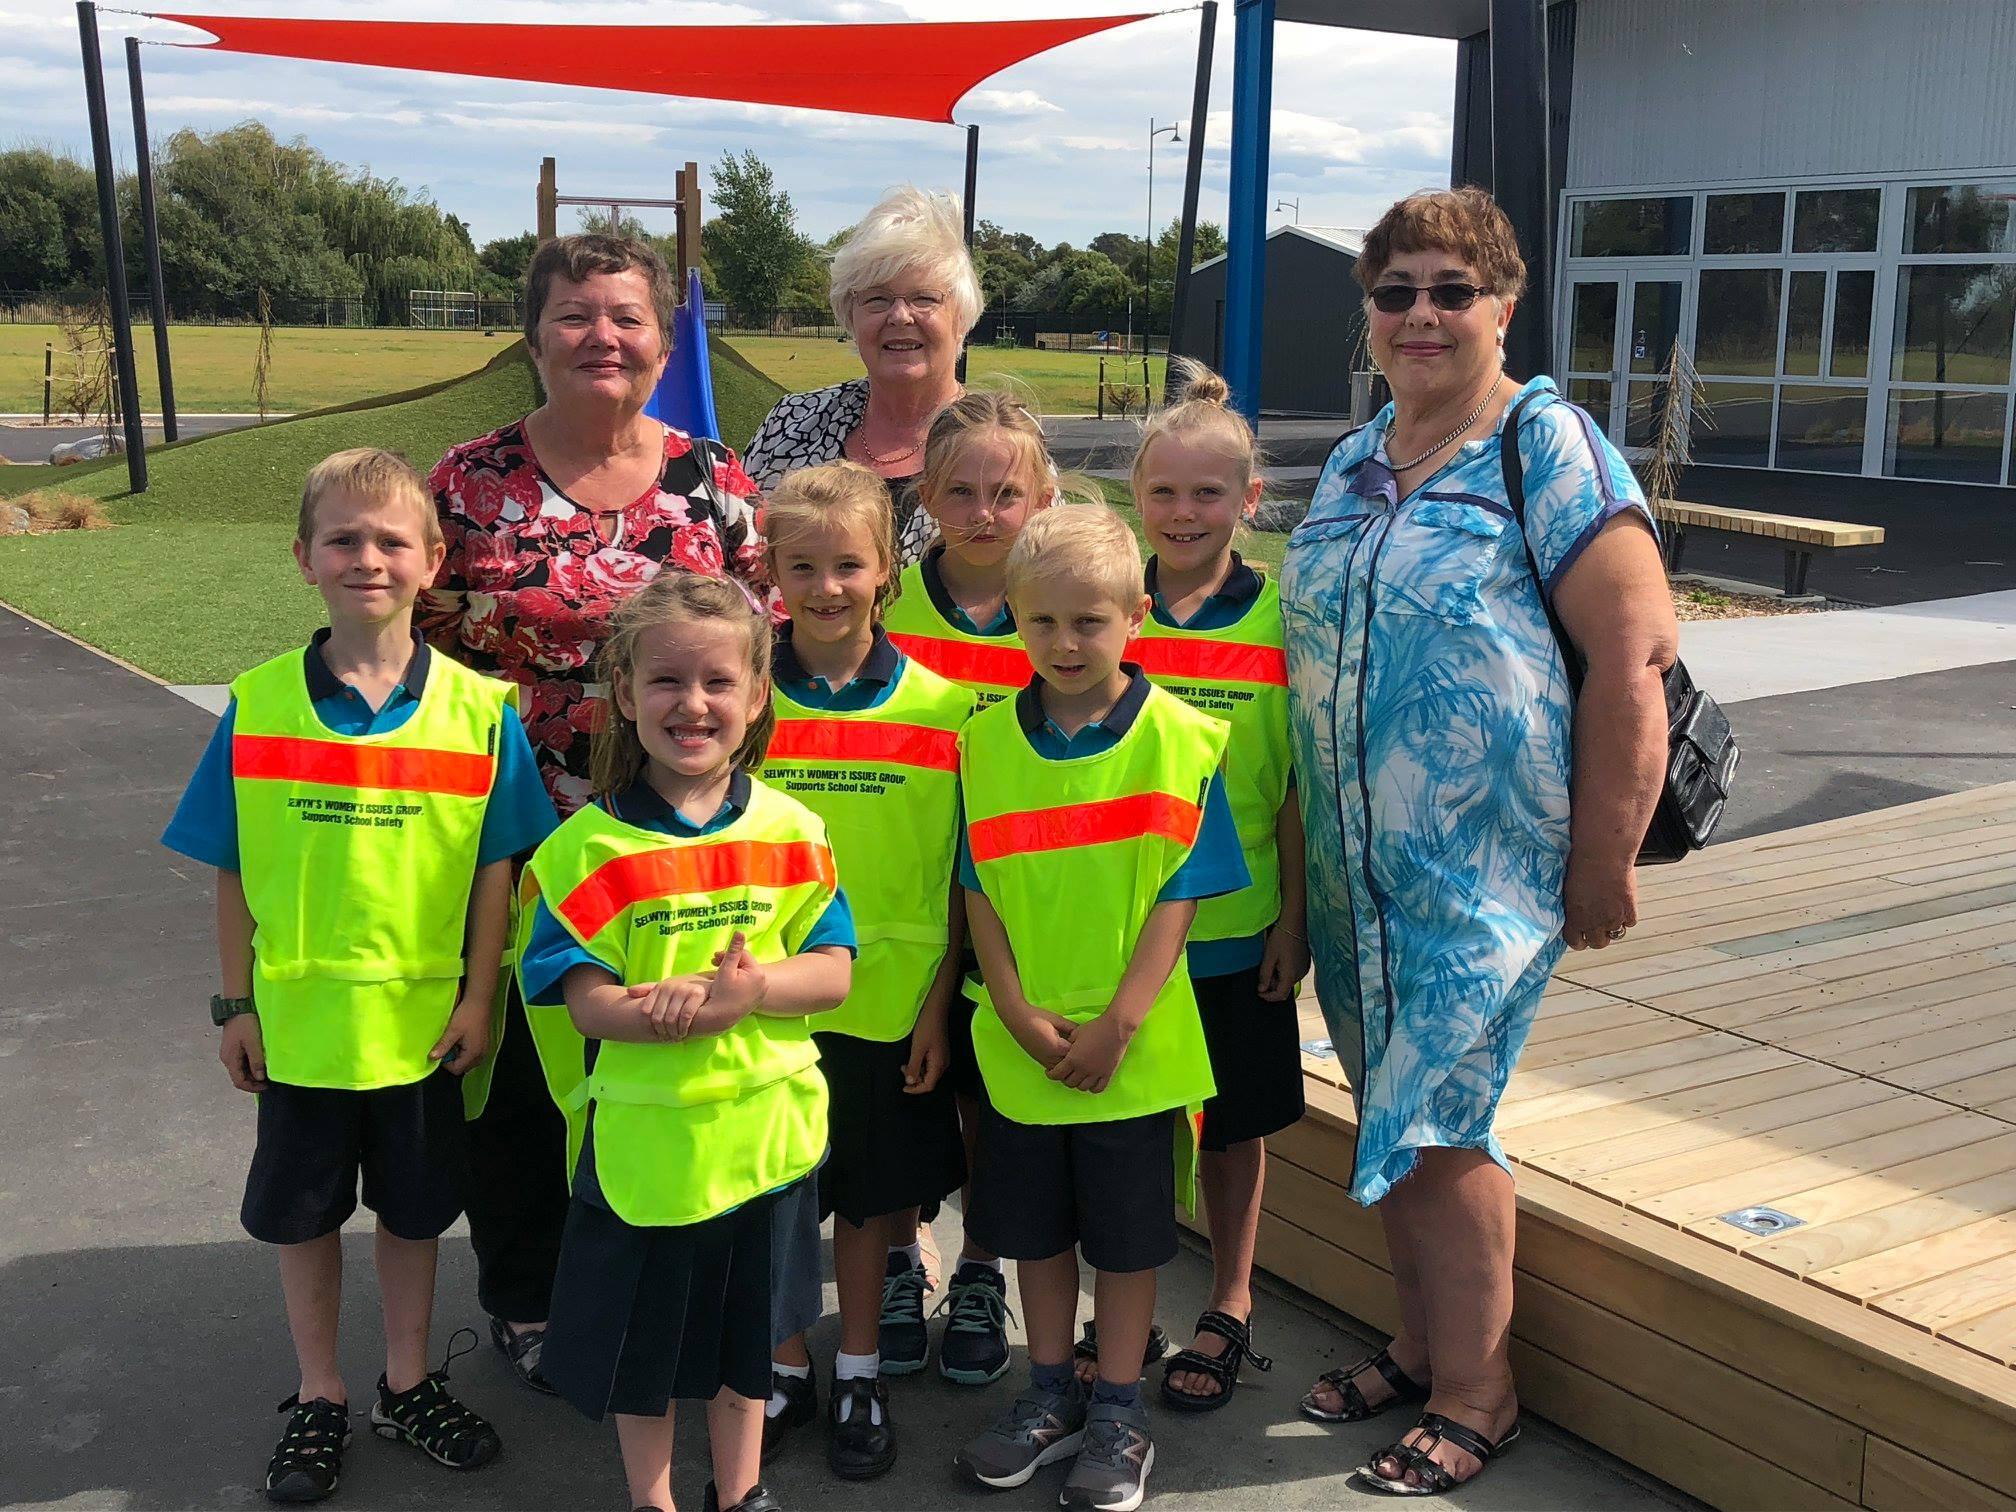 Safety Vests for our Children